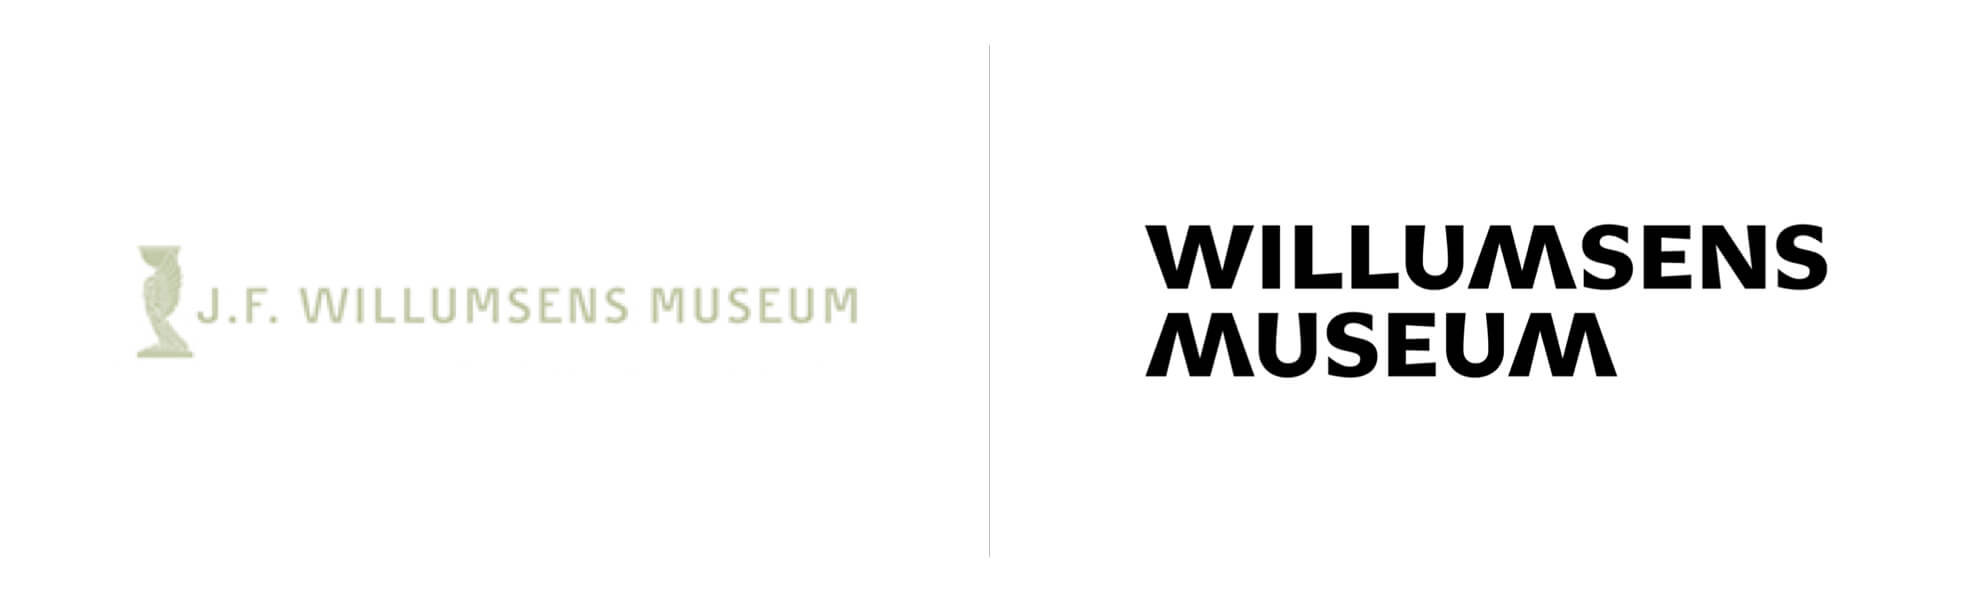 Willumsens Museum ma nowe logo